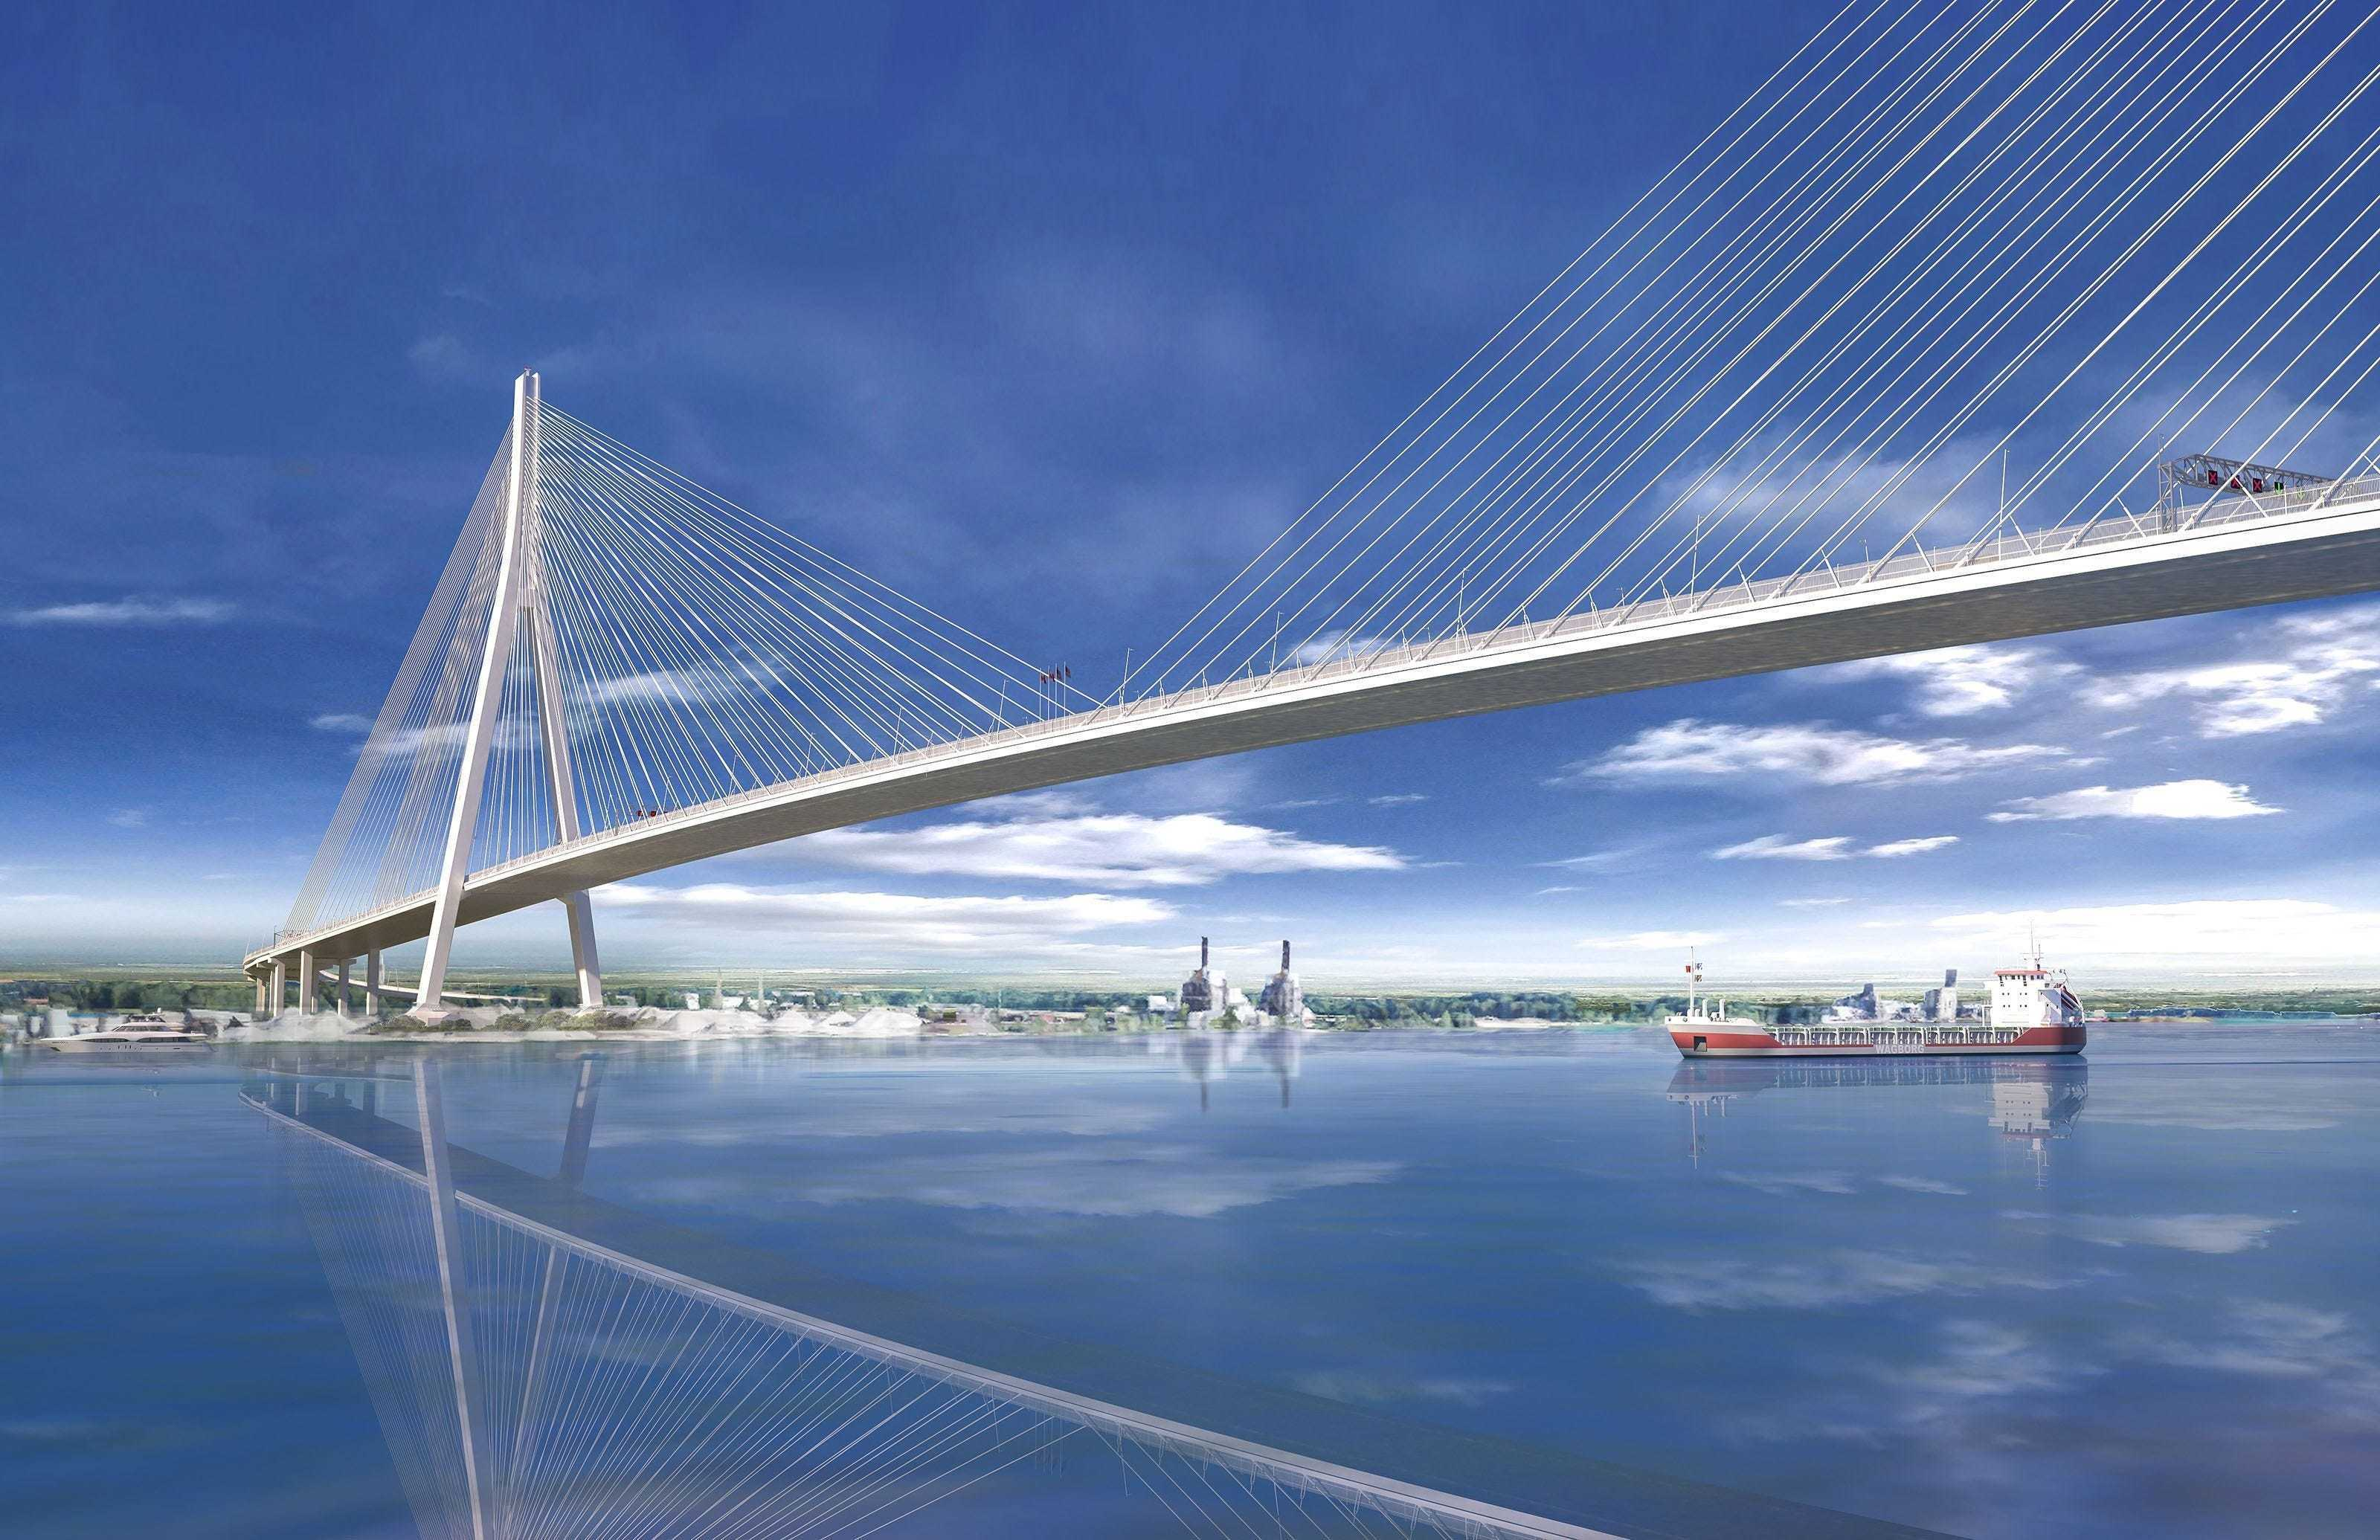 Gordie Howe bridge authority doles out $50,000 to Detroit organizations